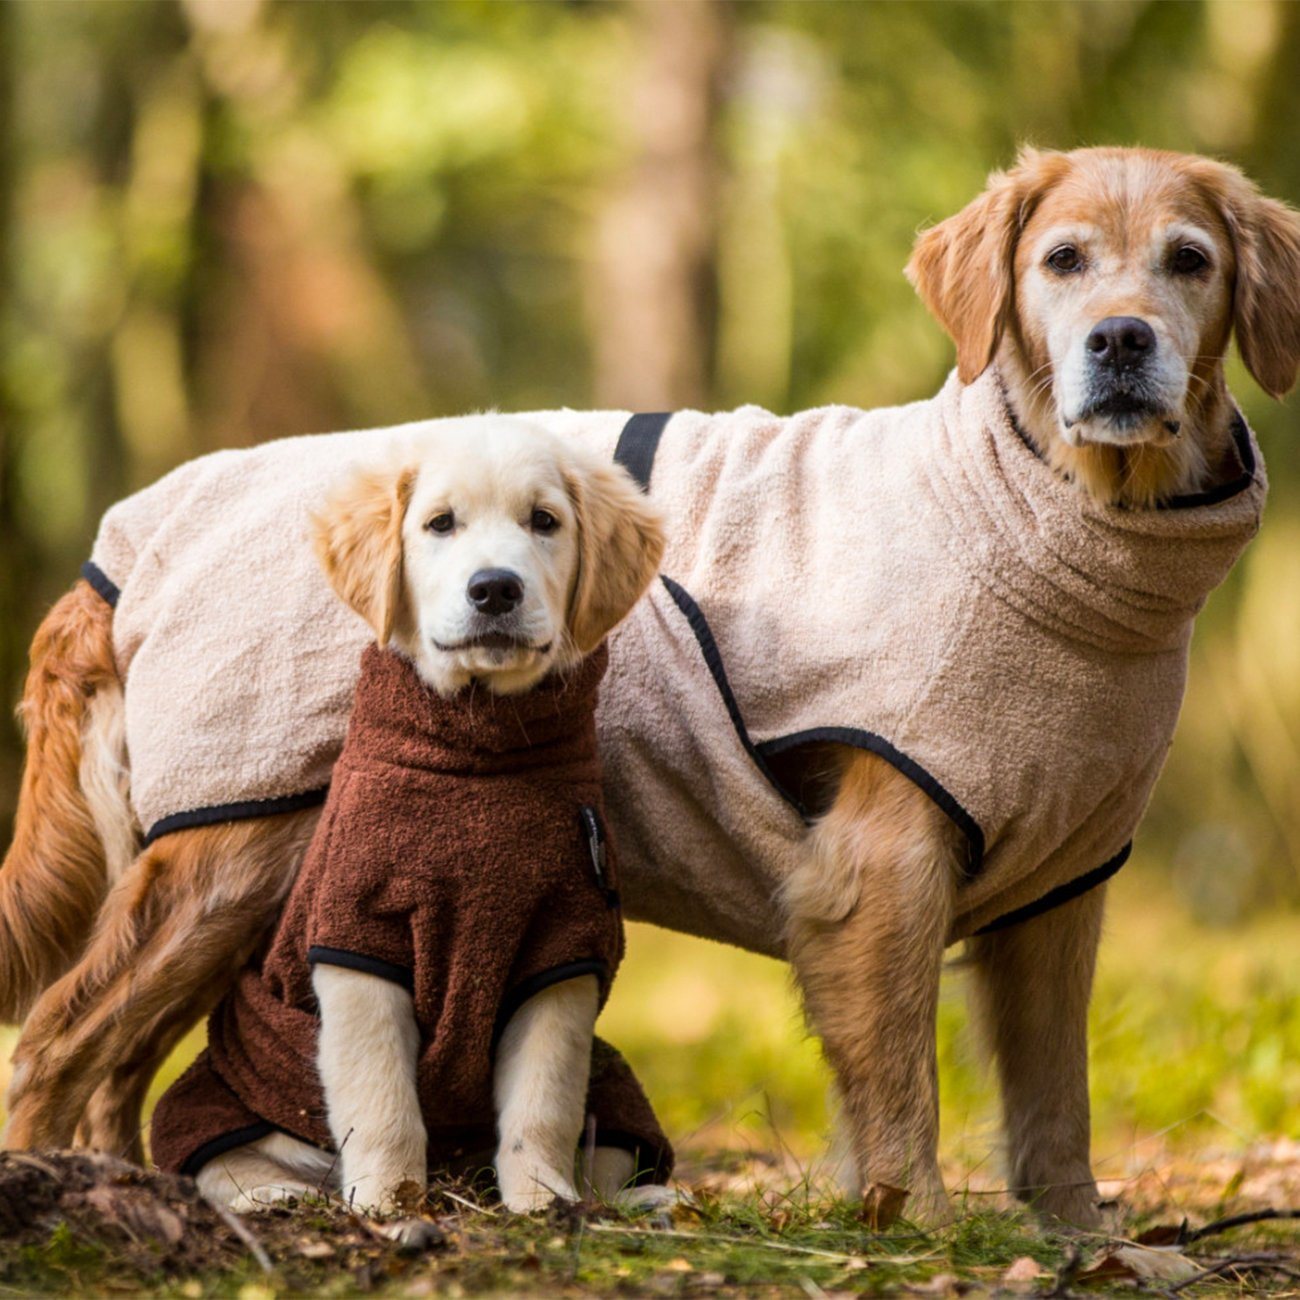 ActionFactory Trockenmantel Hund fit4dogs Dryup Cape, Bild 18